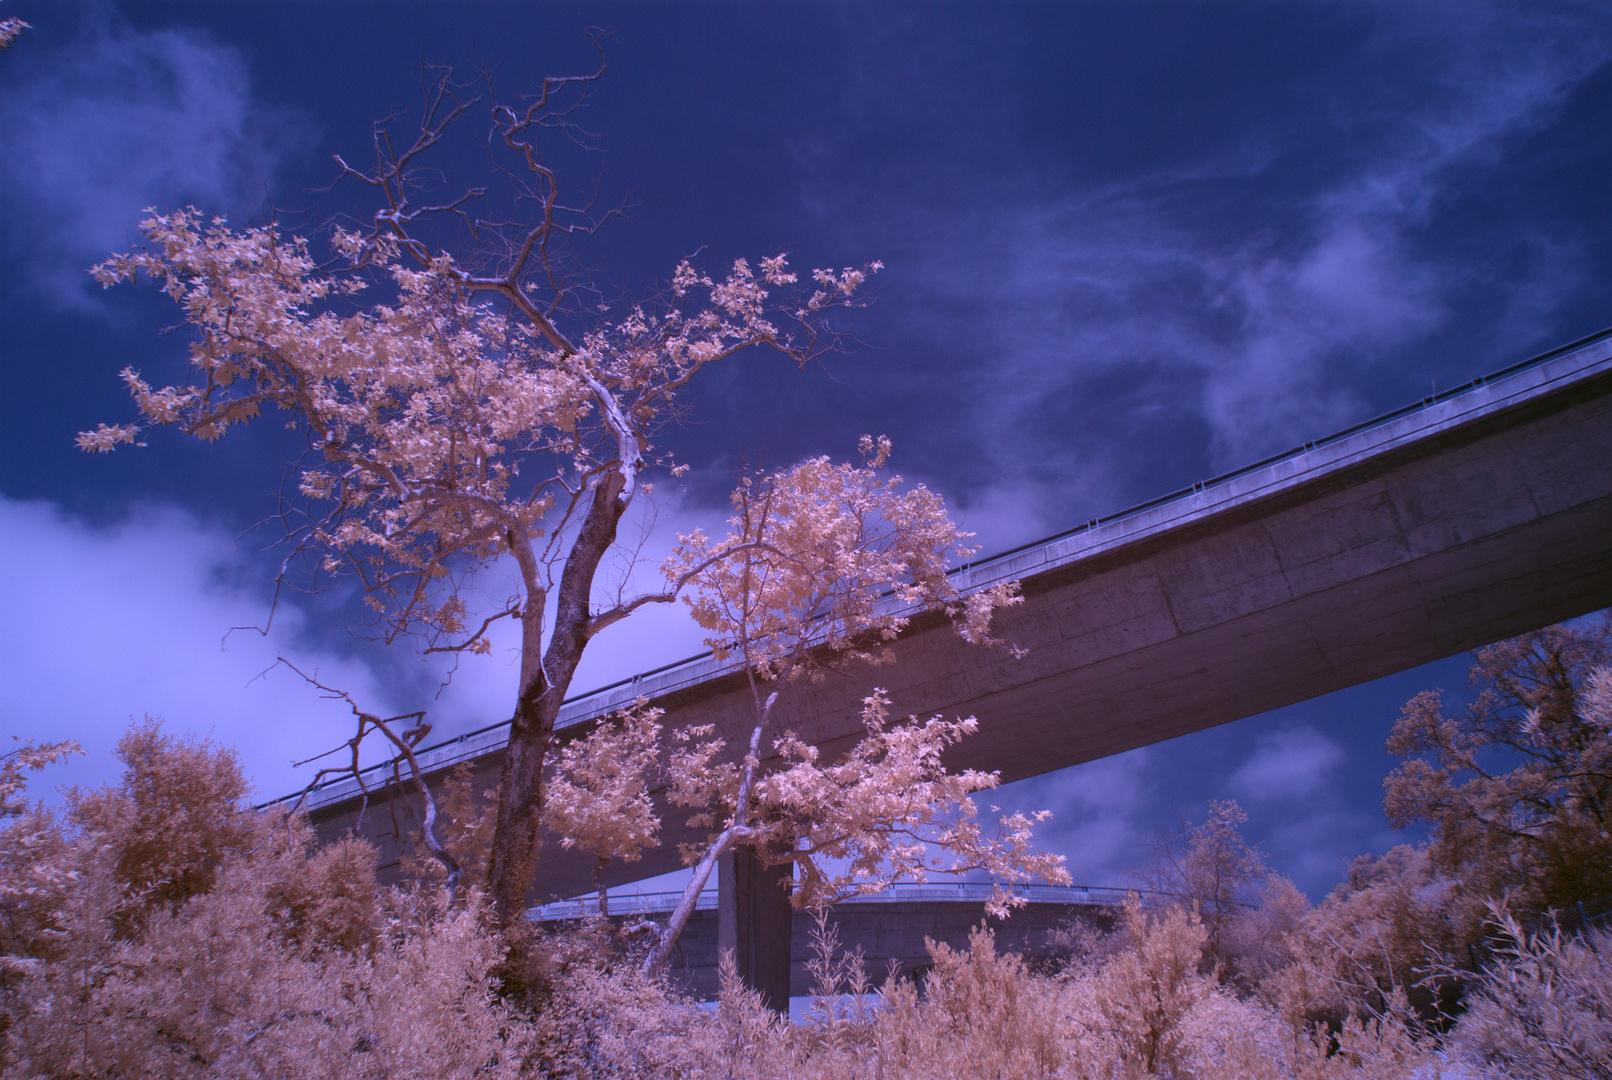 Autobahnbrücke über Wald